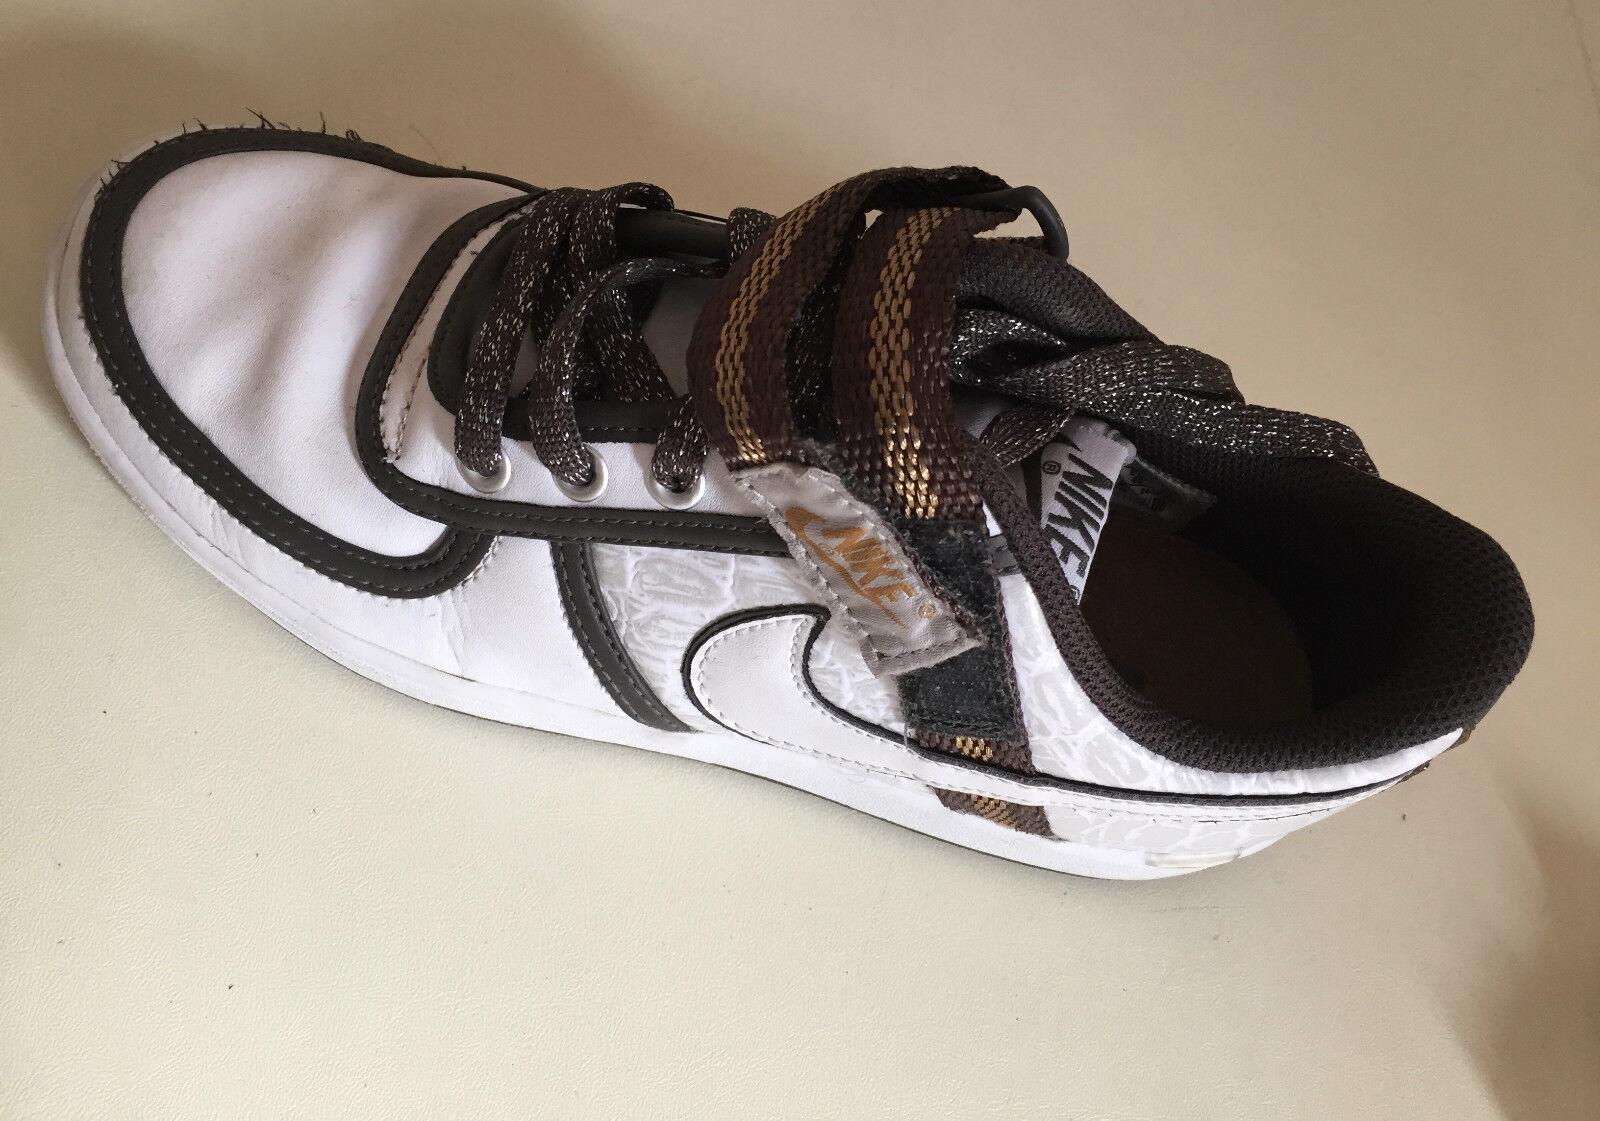 Men's  Size Men Nike Trainers Size  6 Athletic Shoes 5f3635